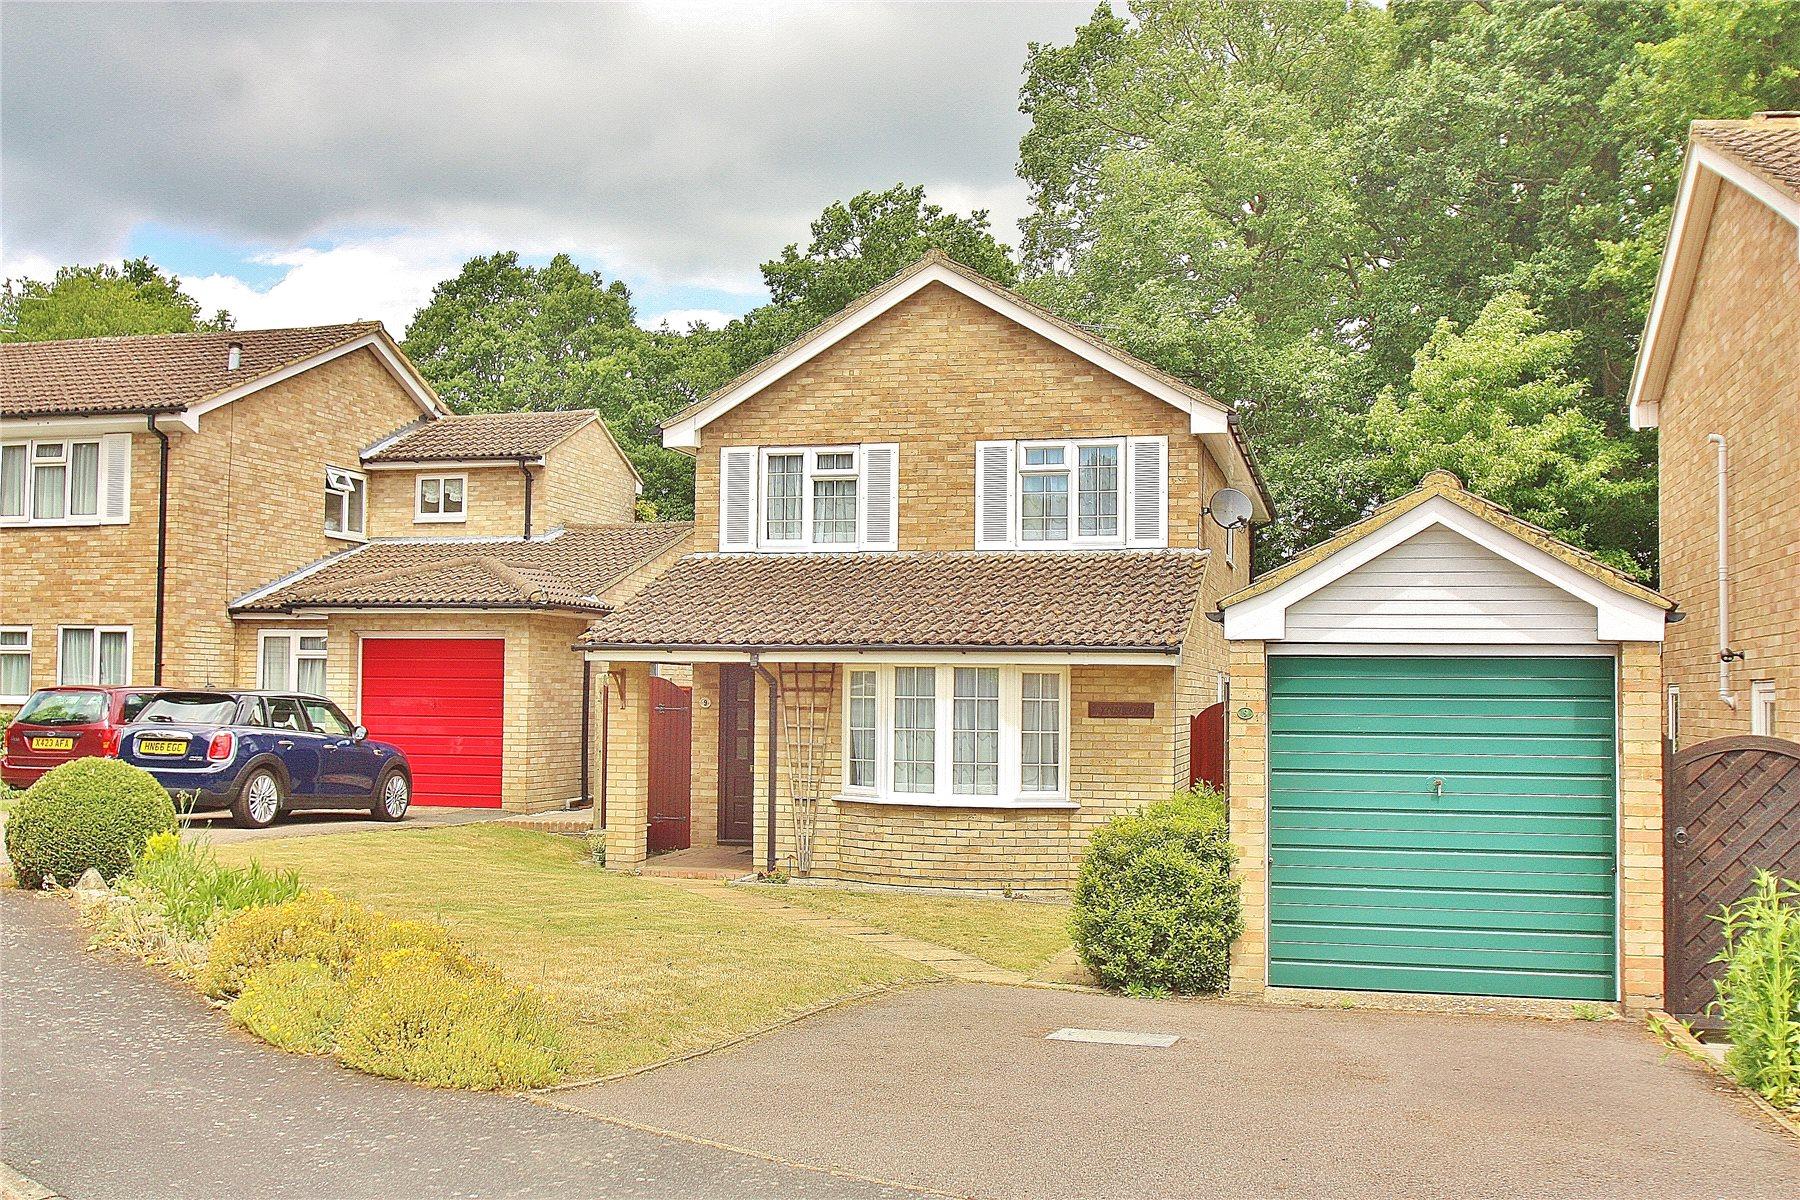 4 Bedrooms Detached House for sale in Lockswood, Brookwood, Woking, Surrey, GU24